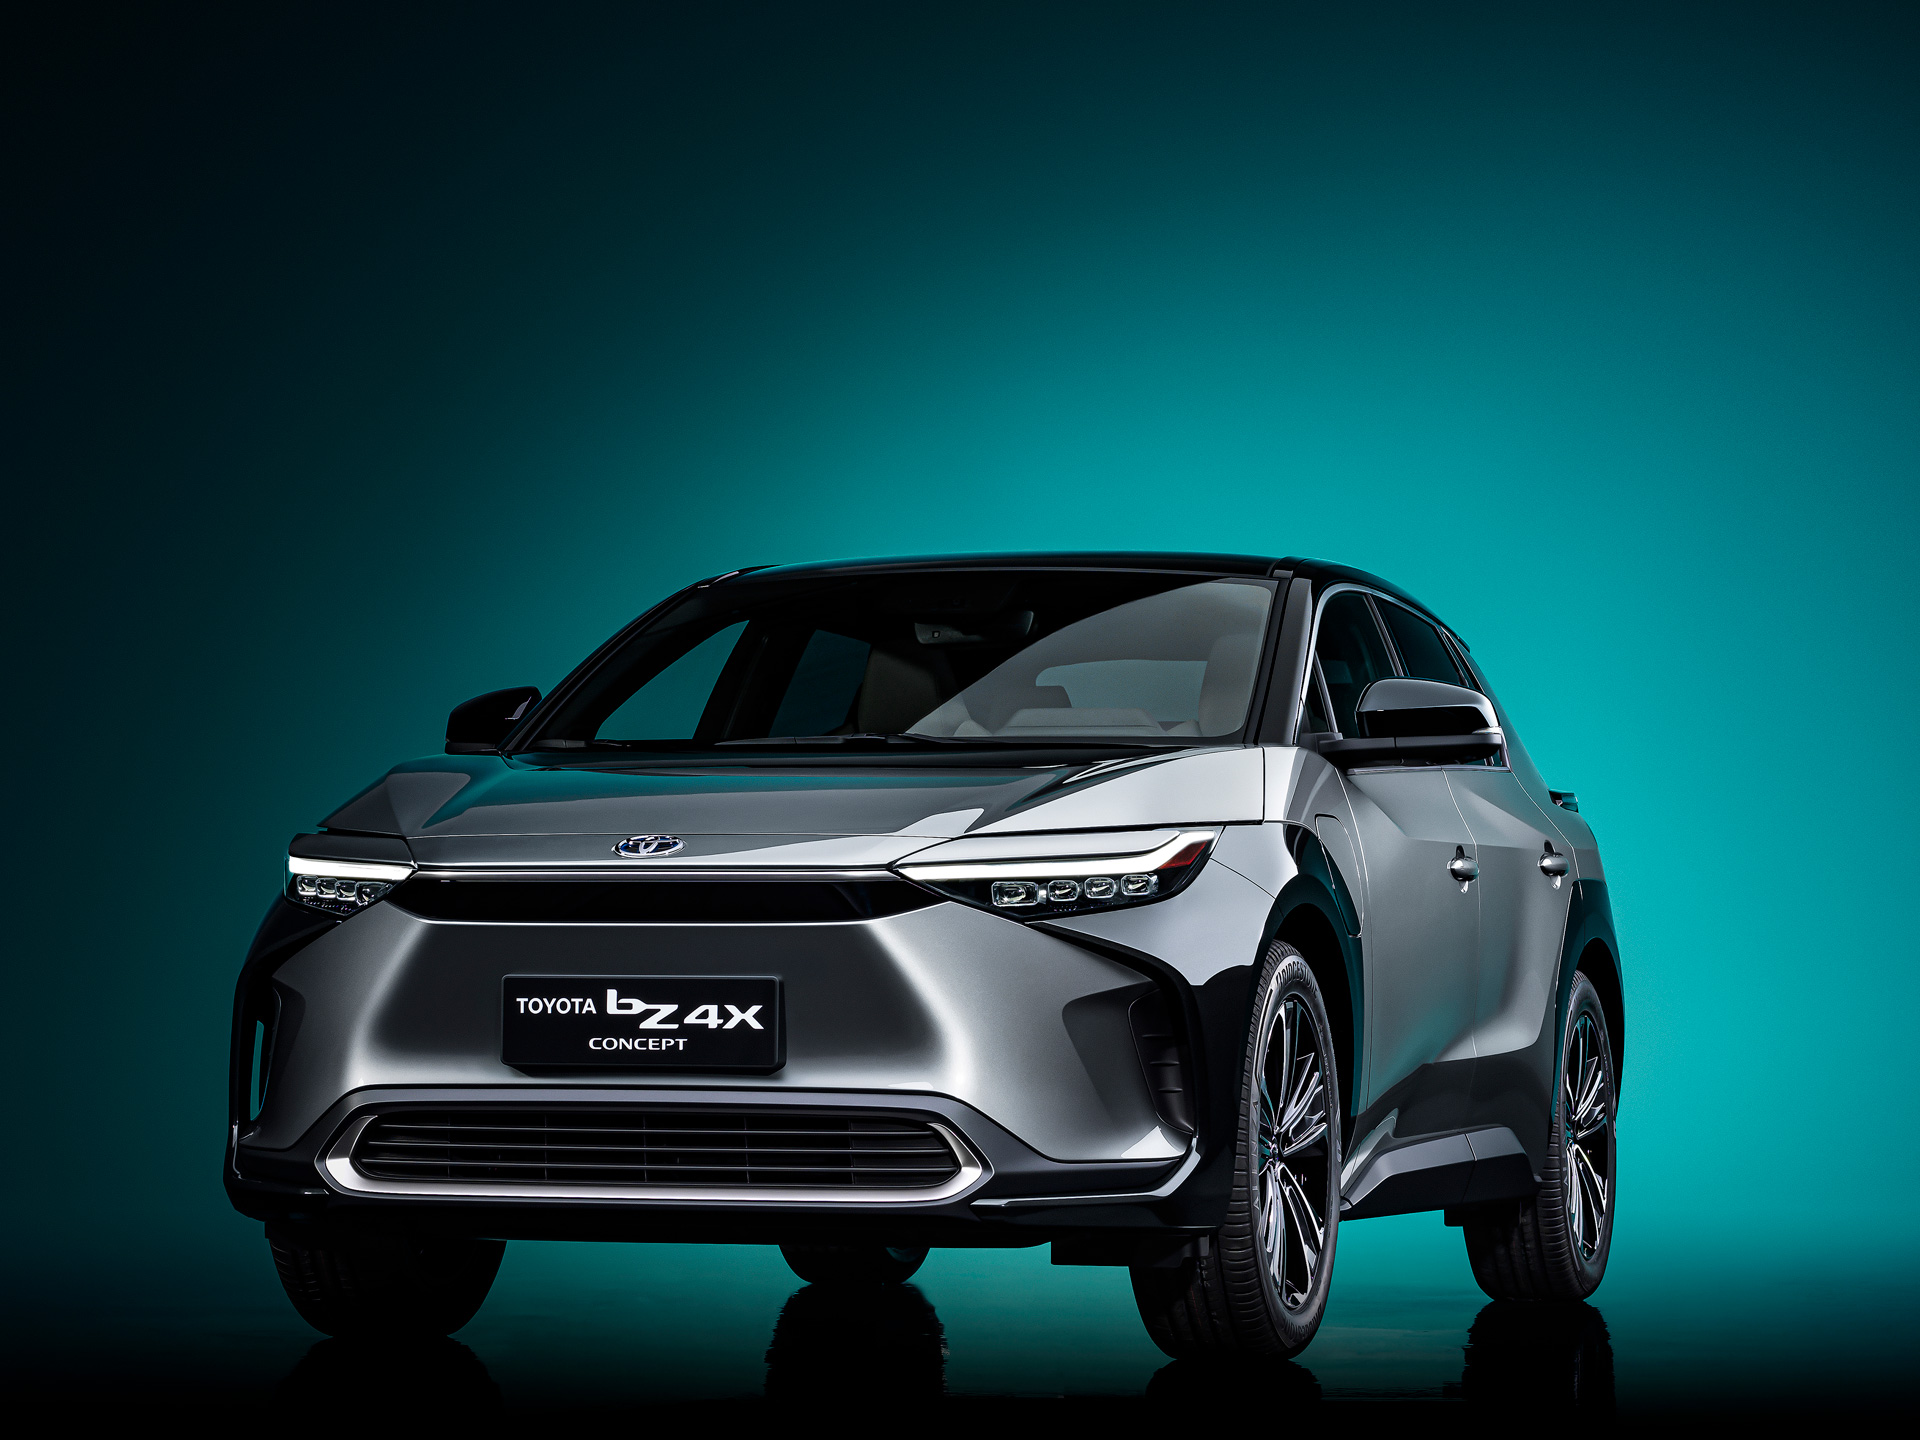 H Toyota θα παρουσιάσει 15 ηλεκτρικά οχήματα μέχρι το 2025